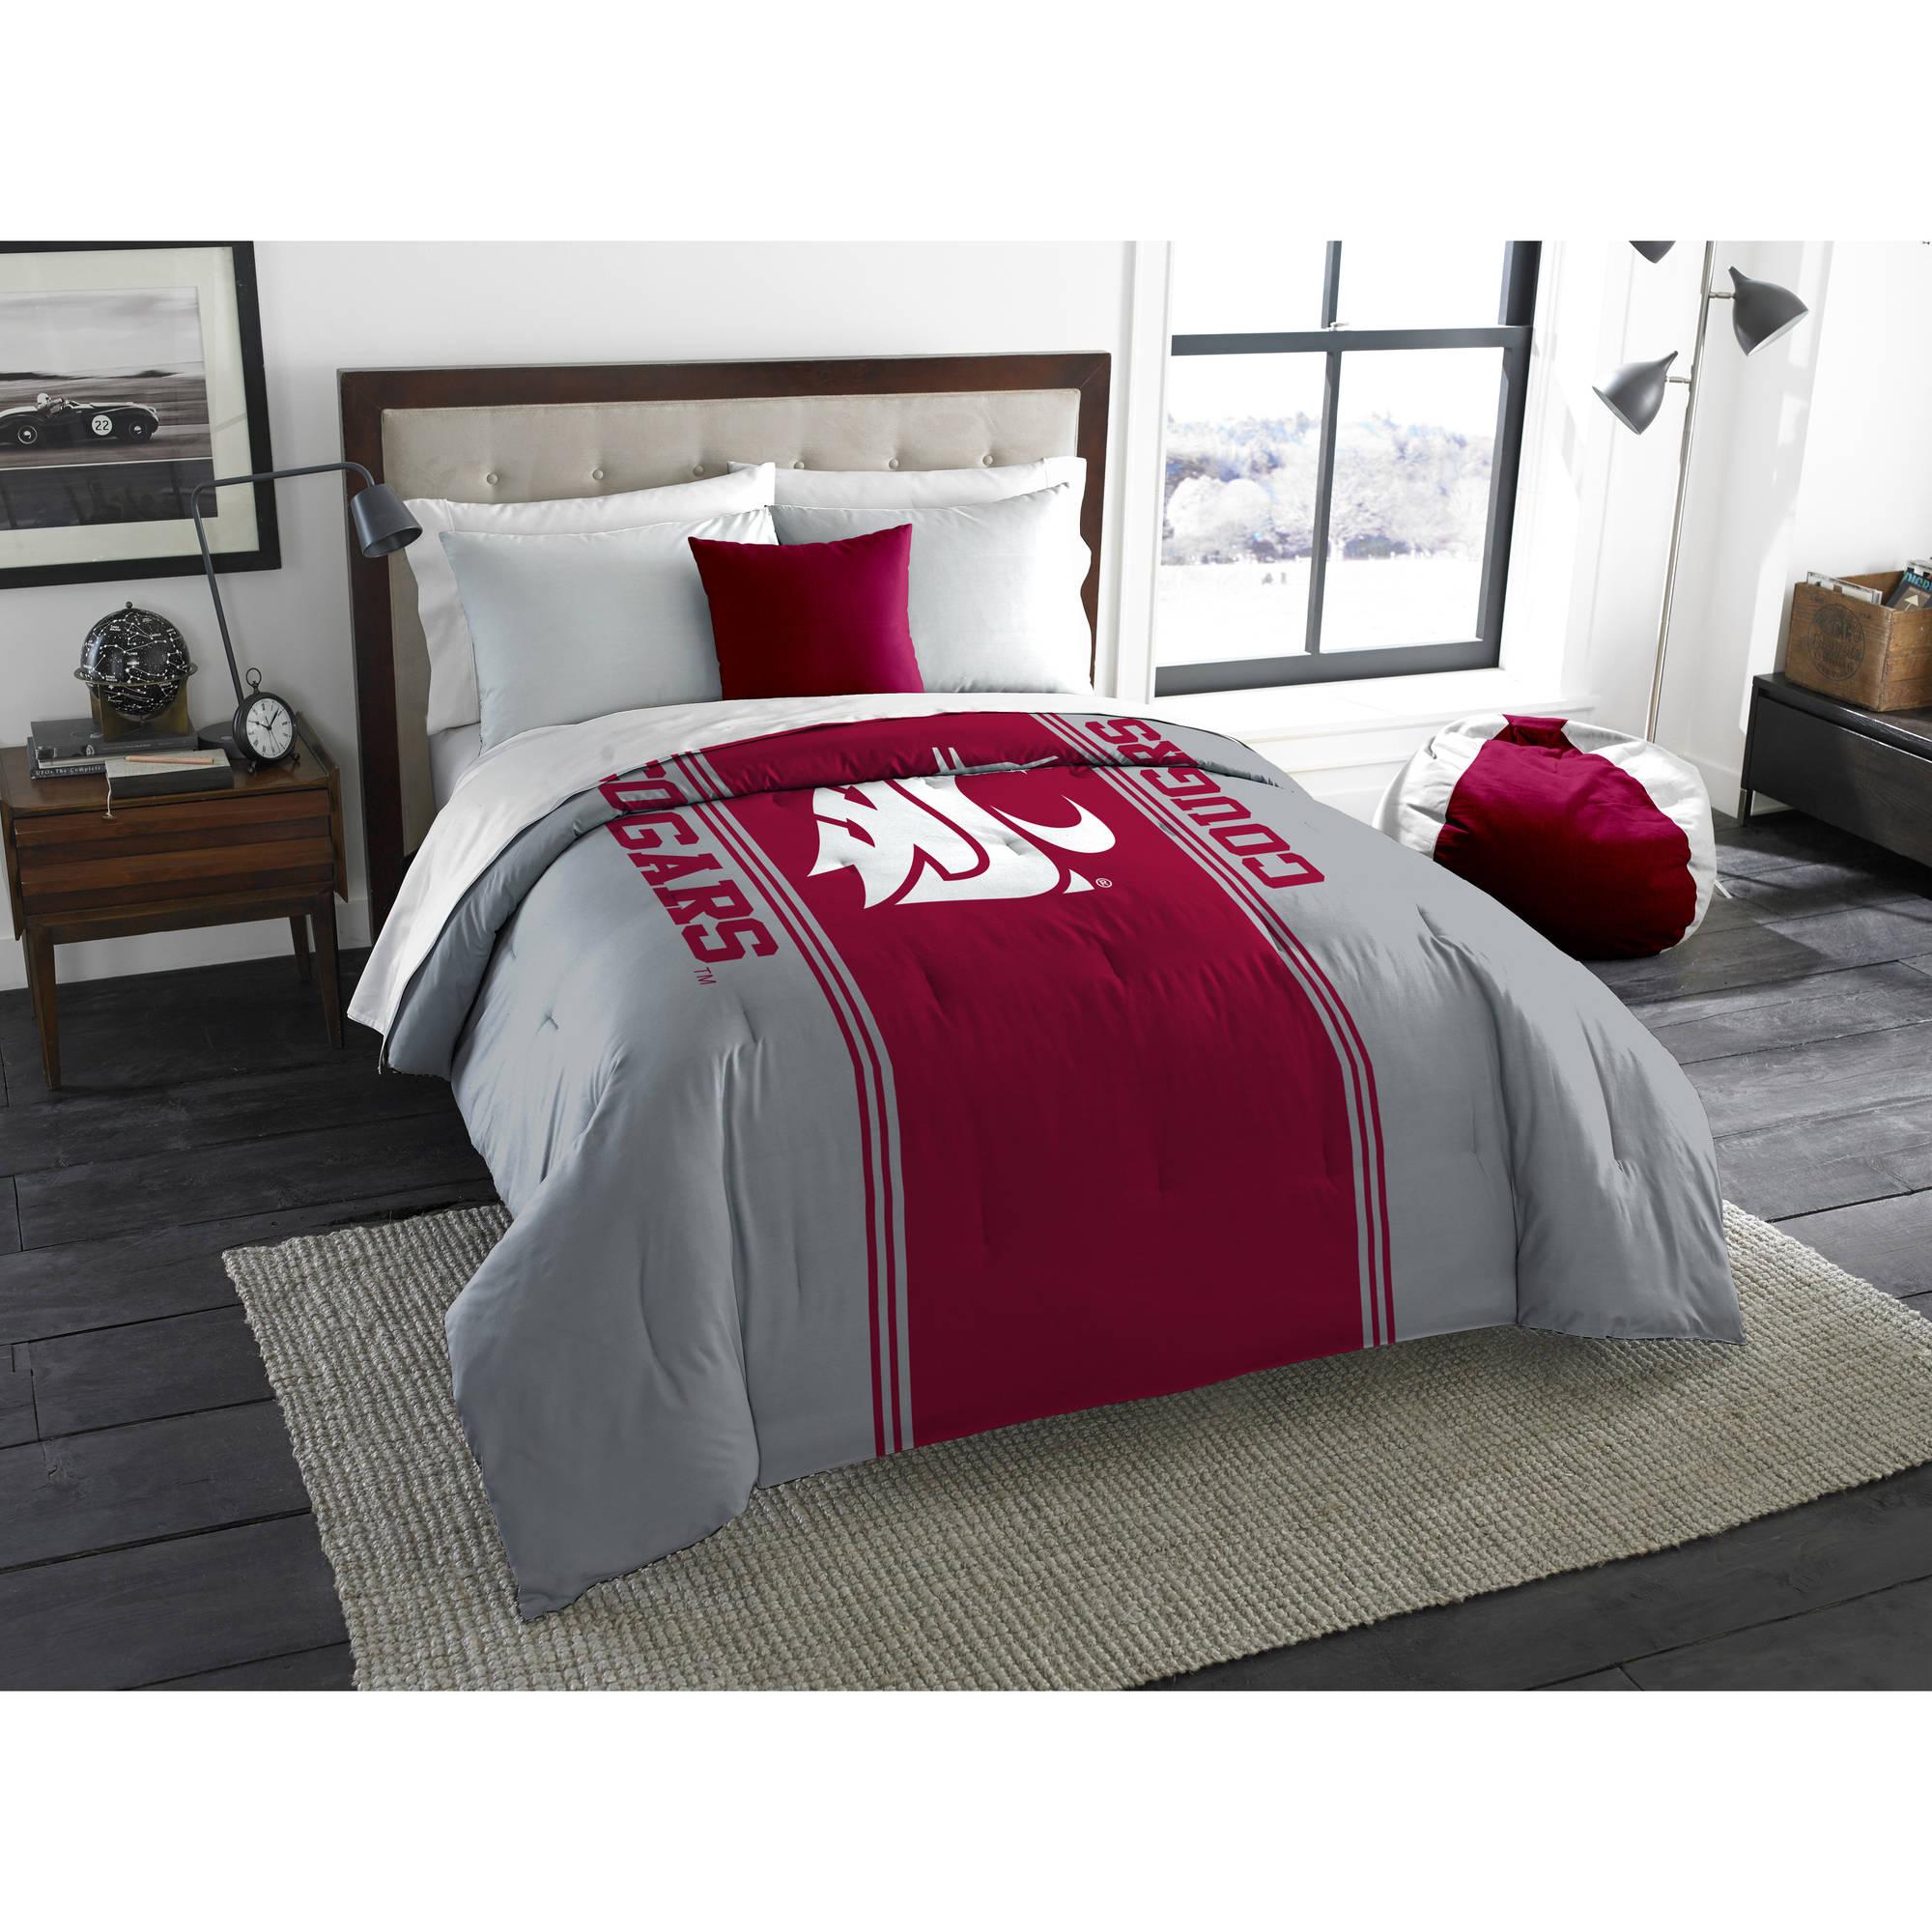 "NCAA Washington State Cougars ""Mascot"" Twin/Full Bedding Comforter"